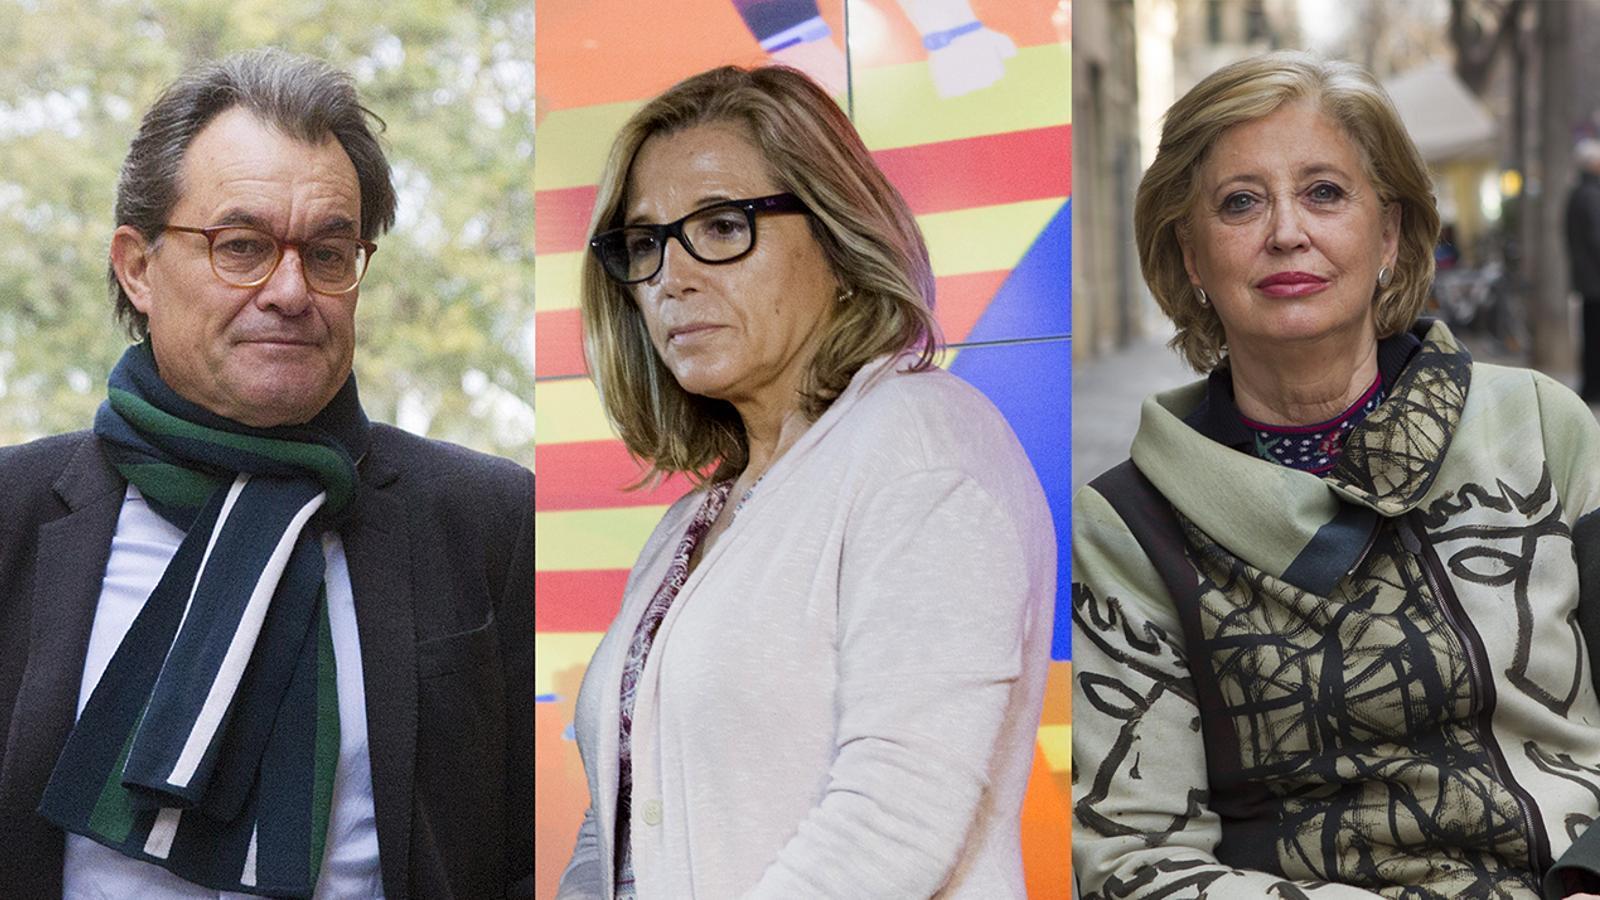 Artur Mas, Joana Ortega, Irene Rigau